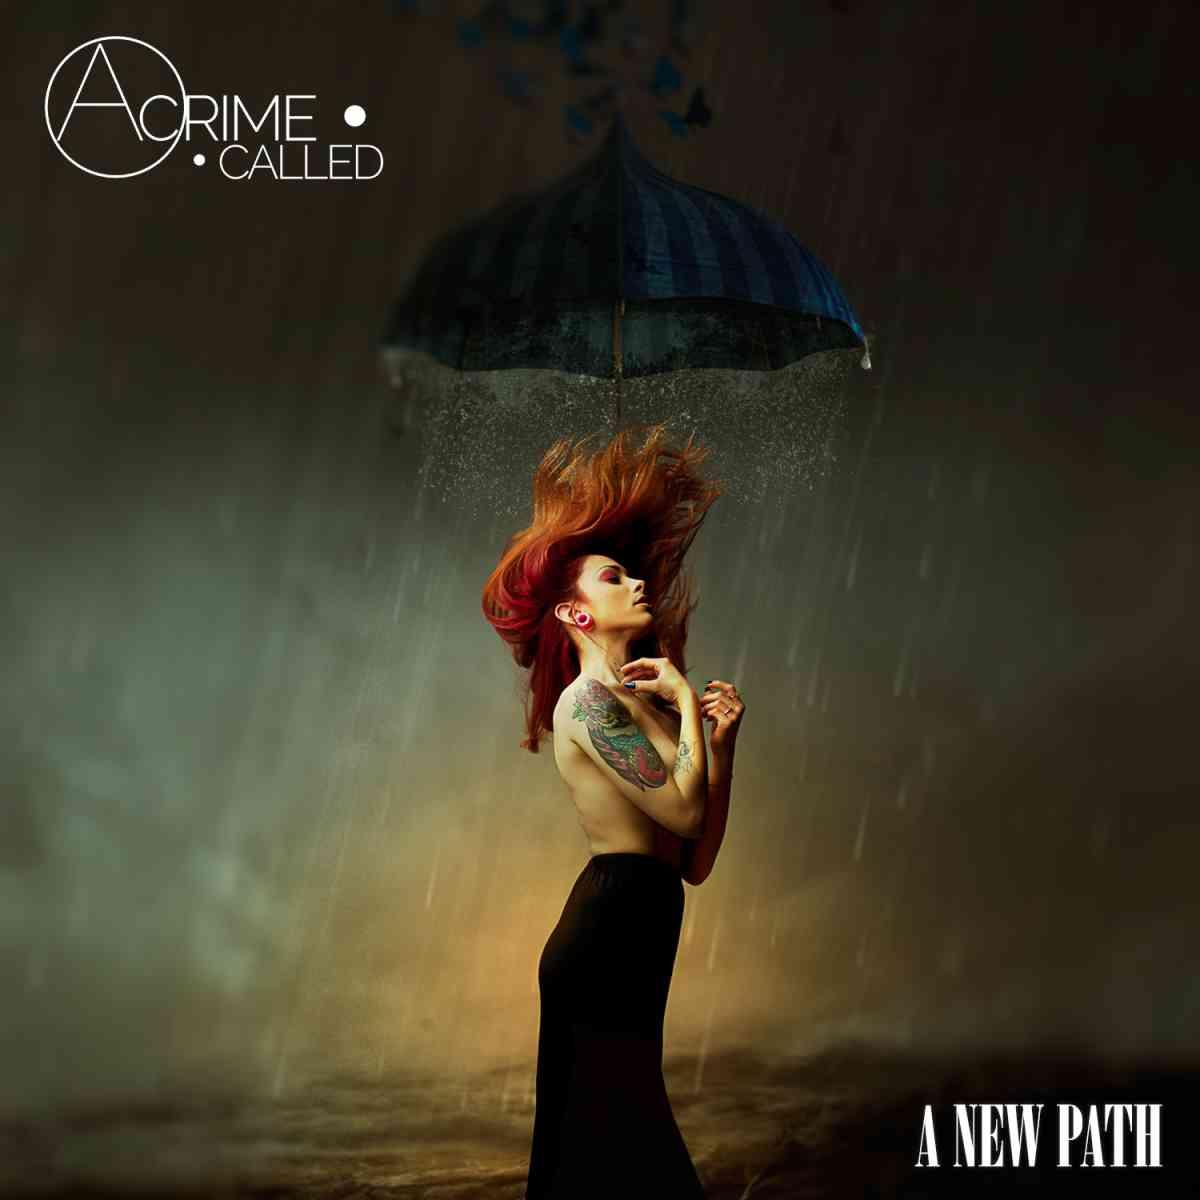 a crim called - a new path - album cover